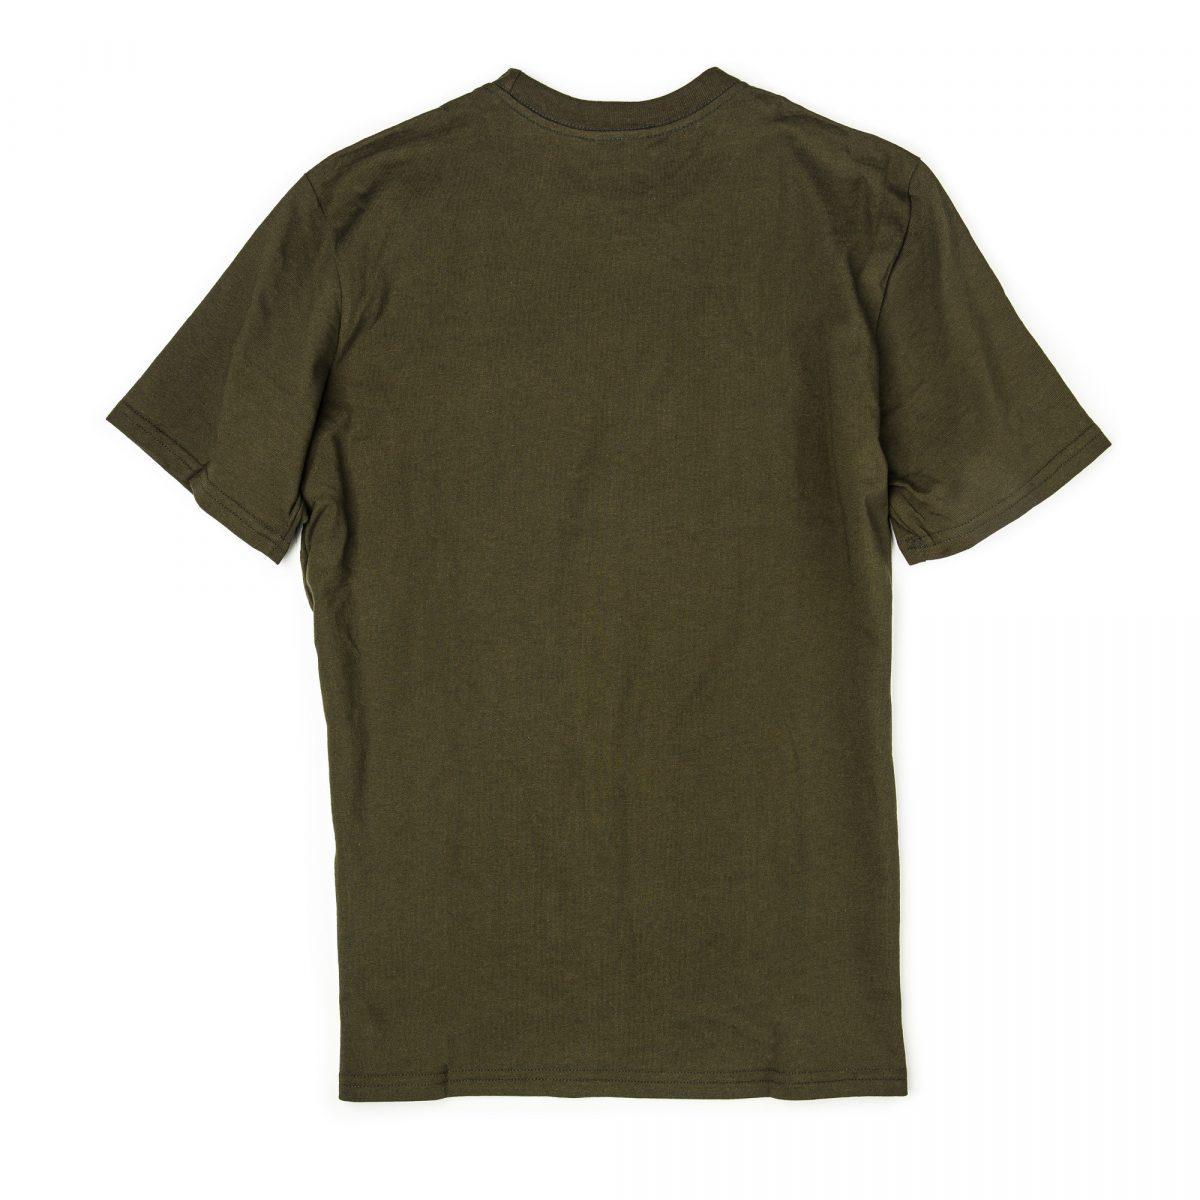 shirts-3173-edit